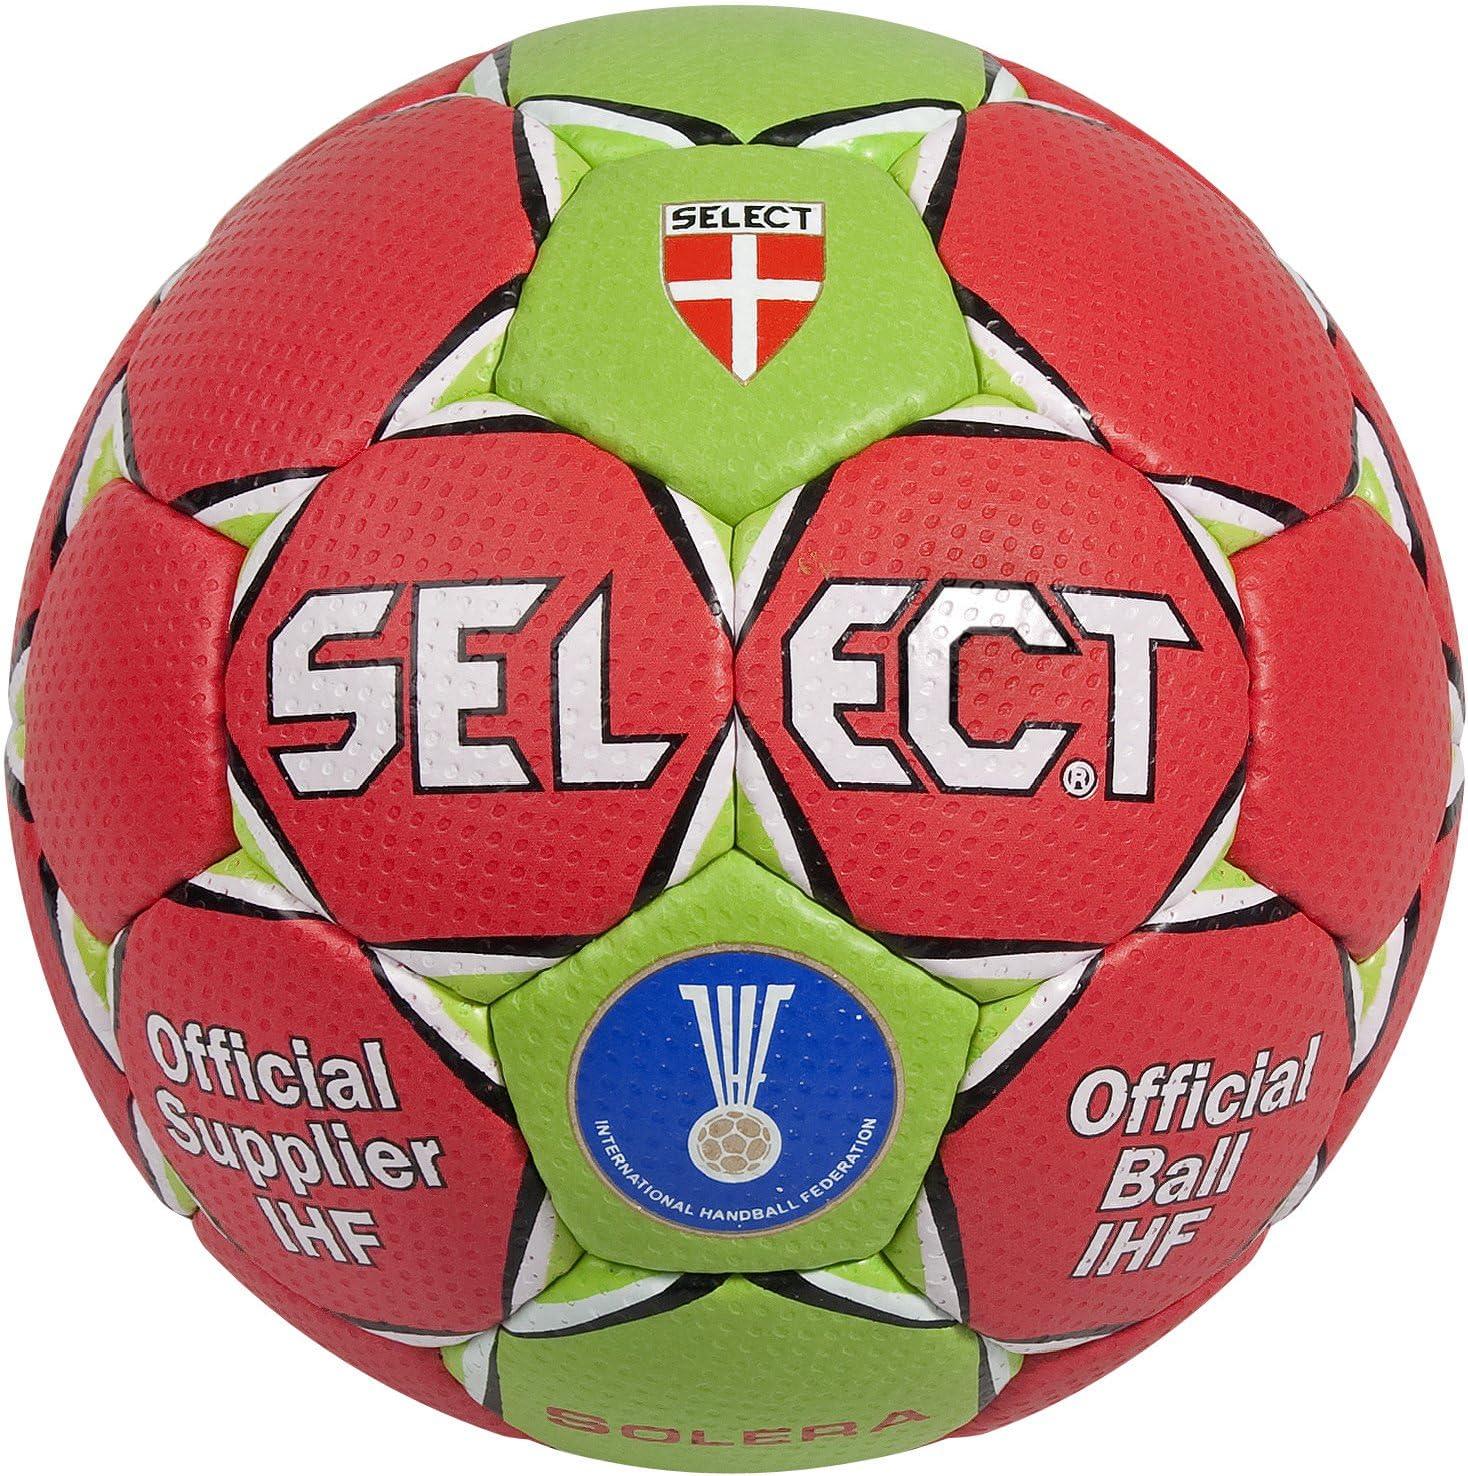 SELECT Trainingsball Solera - Pelota de Balonmano, Color Rojo ...